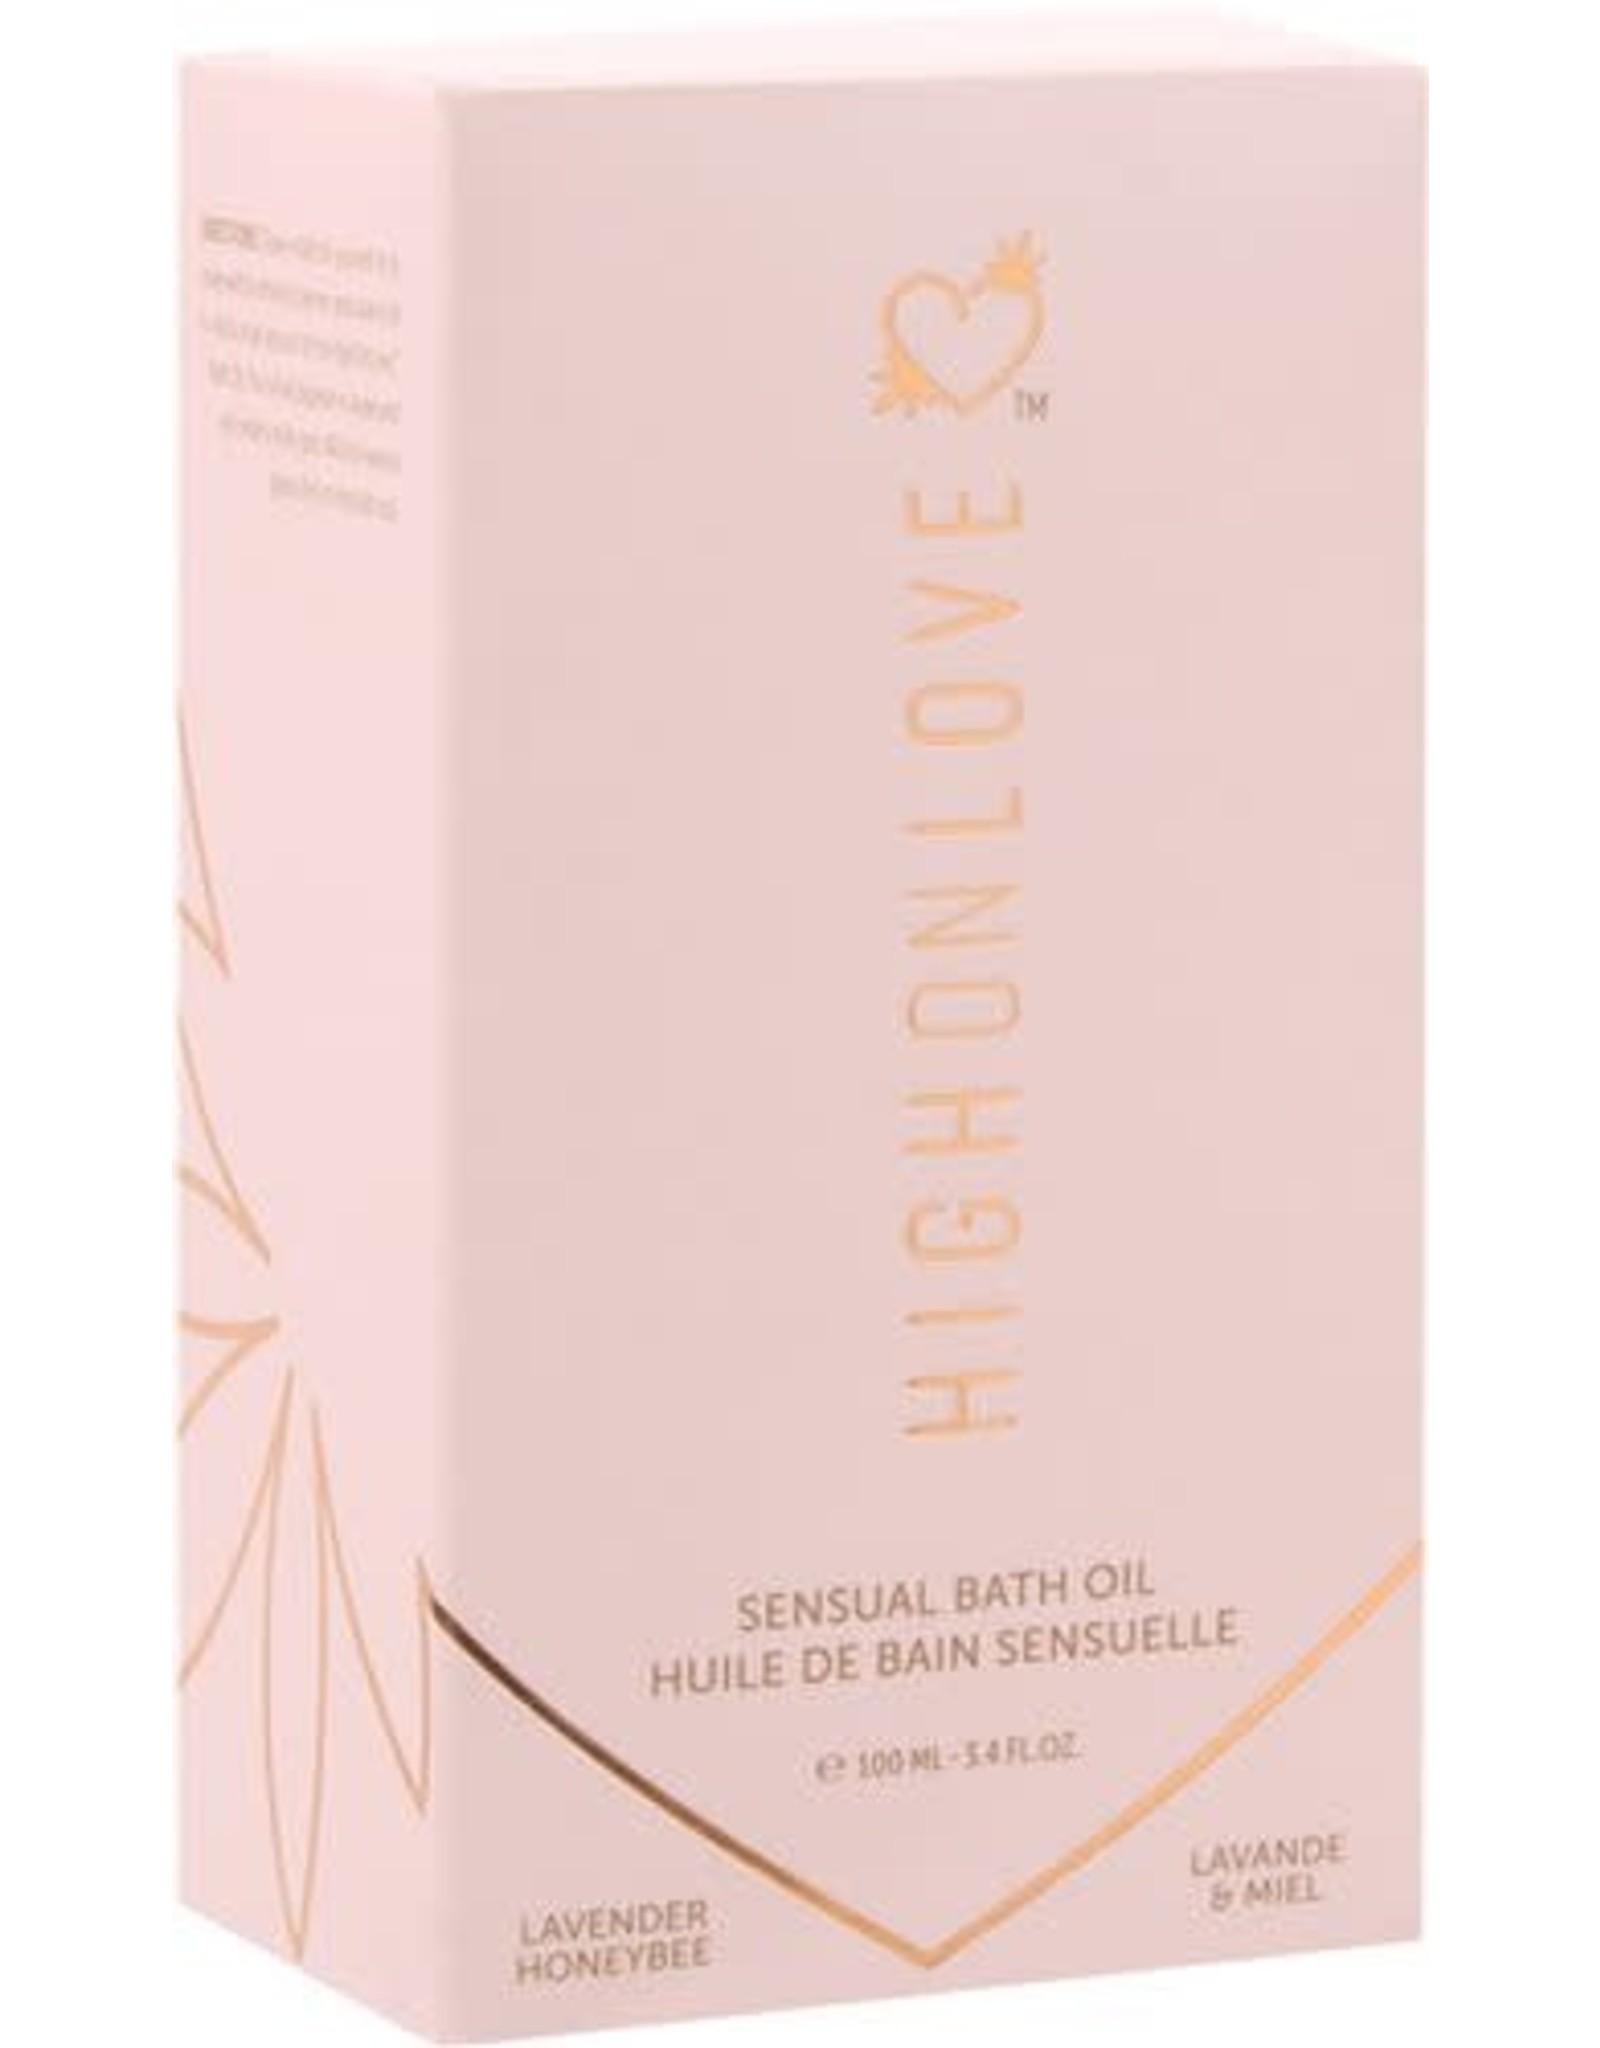 High On Love High On Love Sensual Bath Oil Lavender/Honeybee 3.4oz